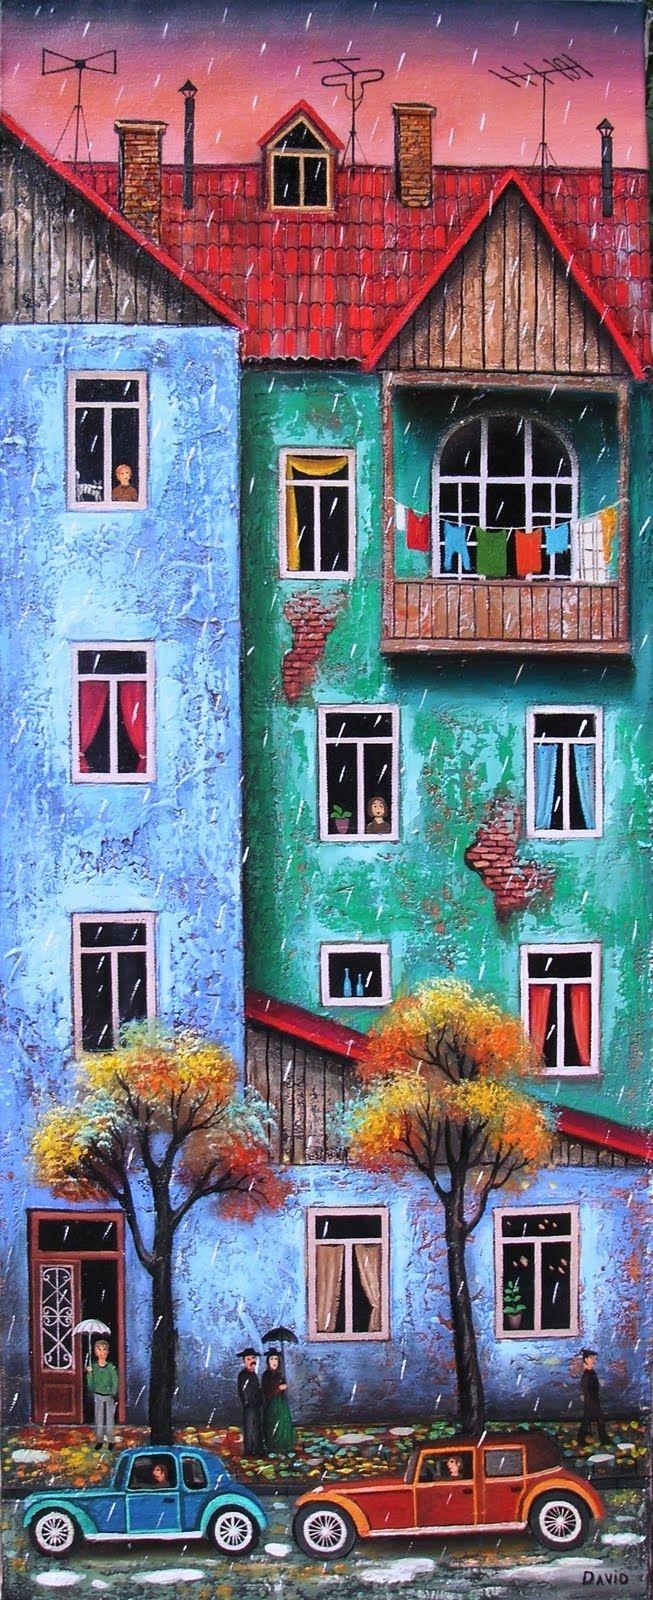 Colorful art